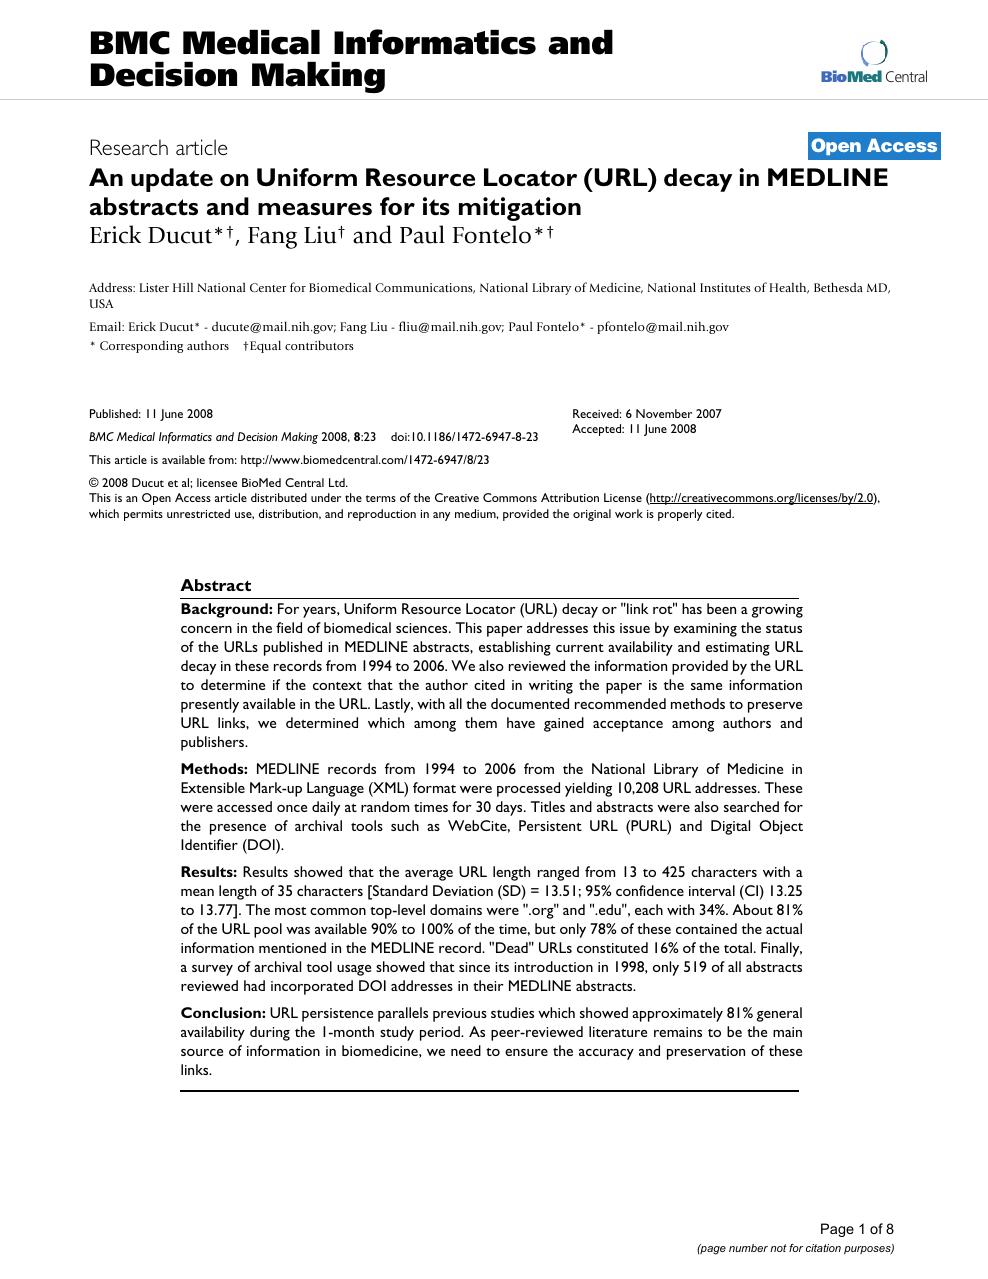 An update on Uniform Resource Locator (URL) decay in MEDLINE